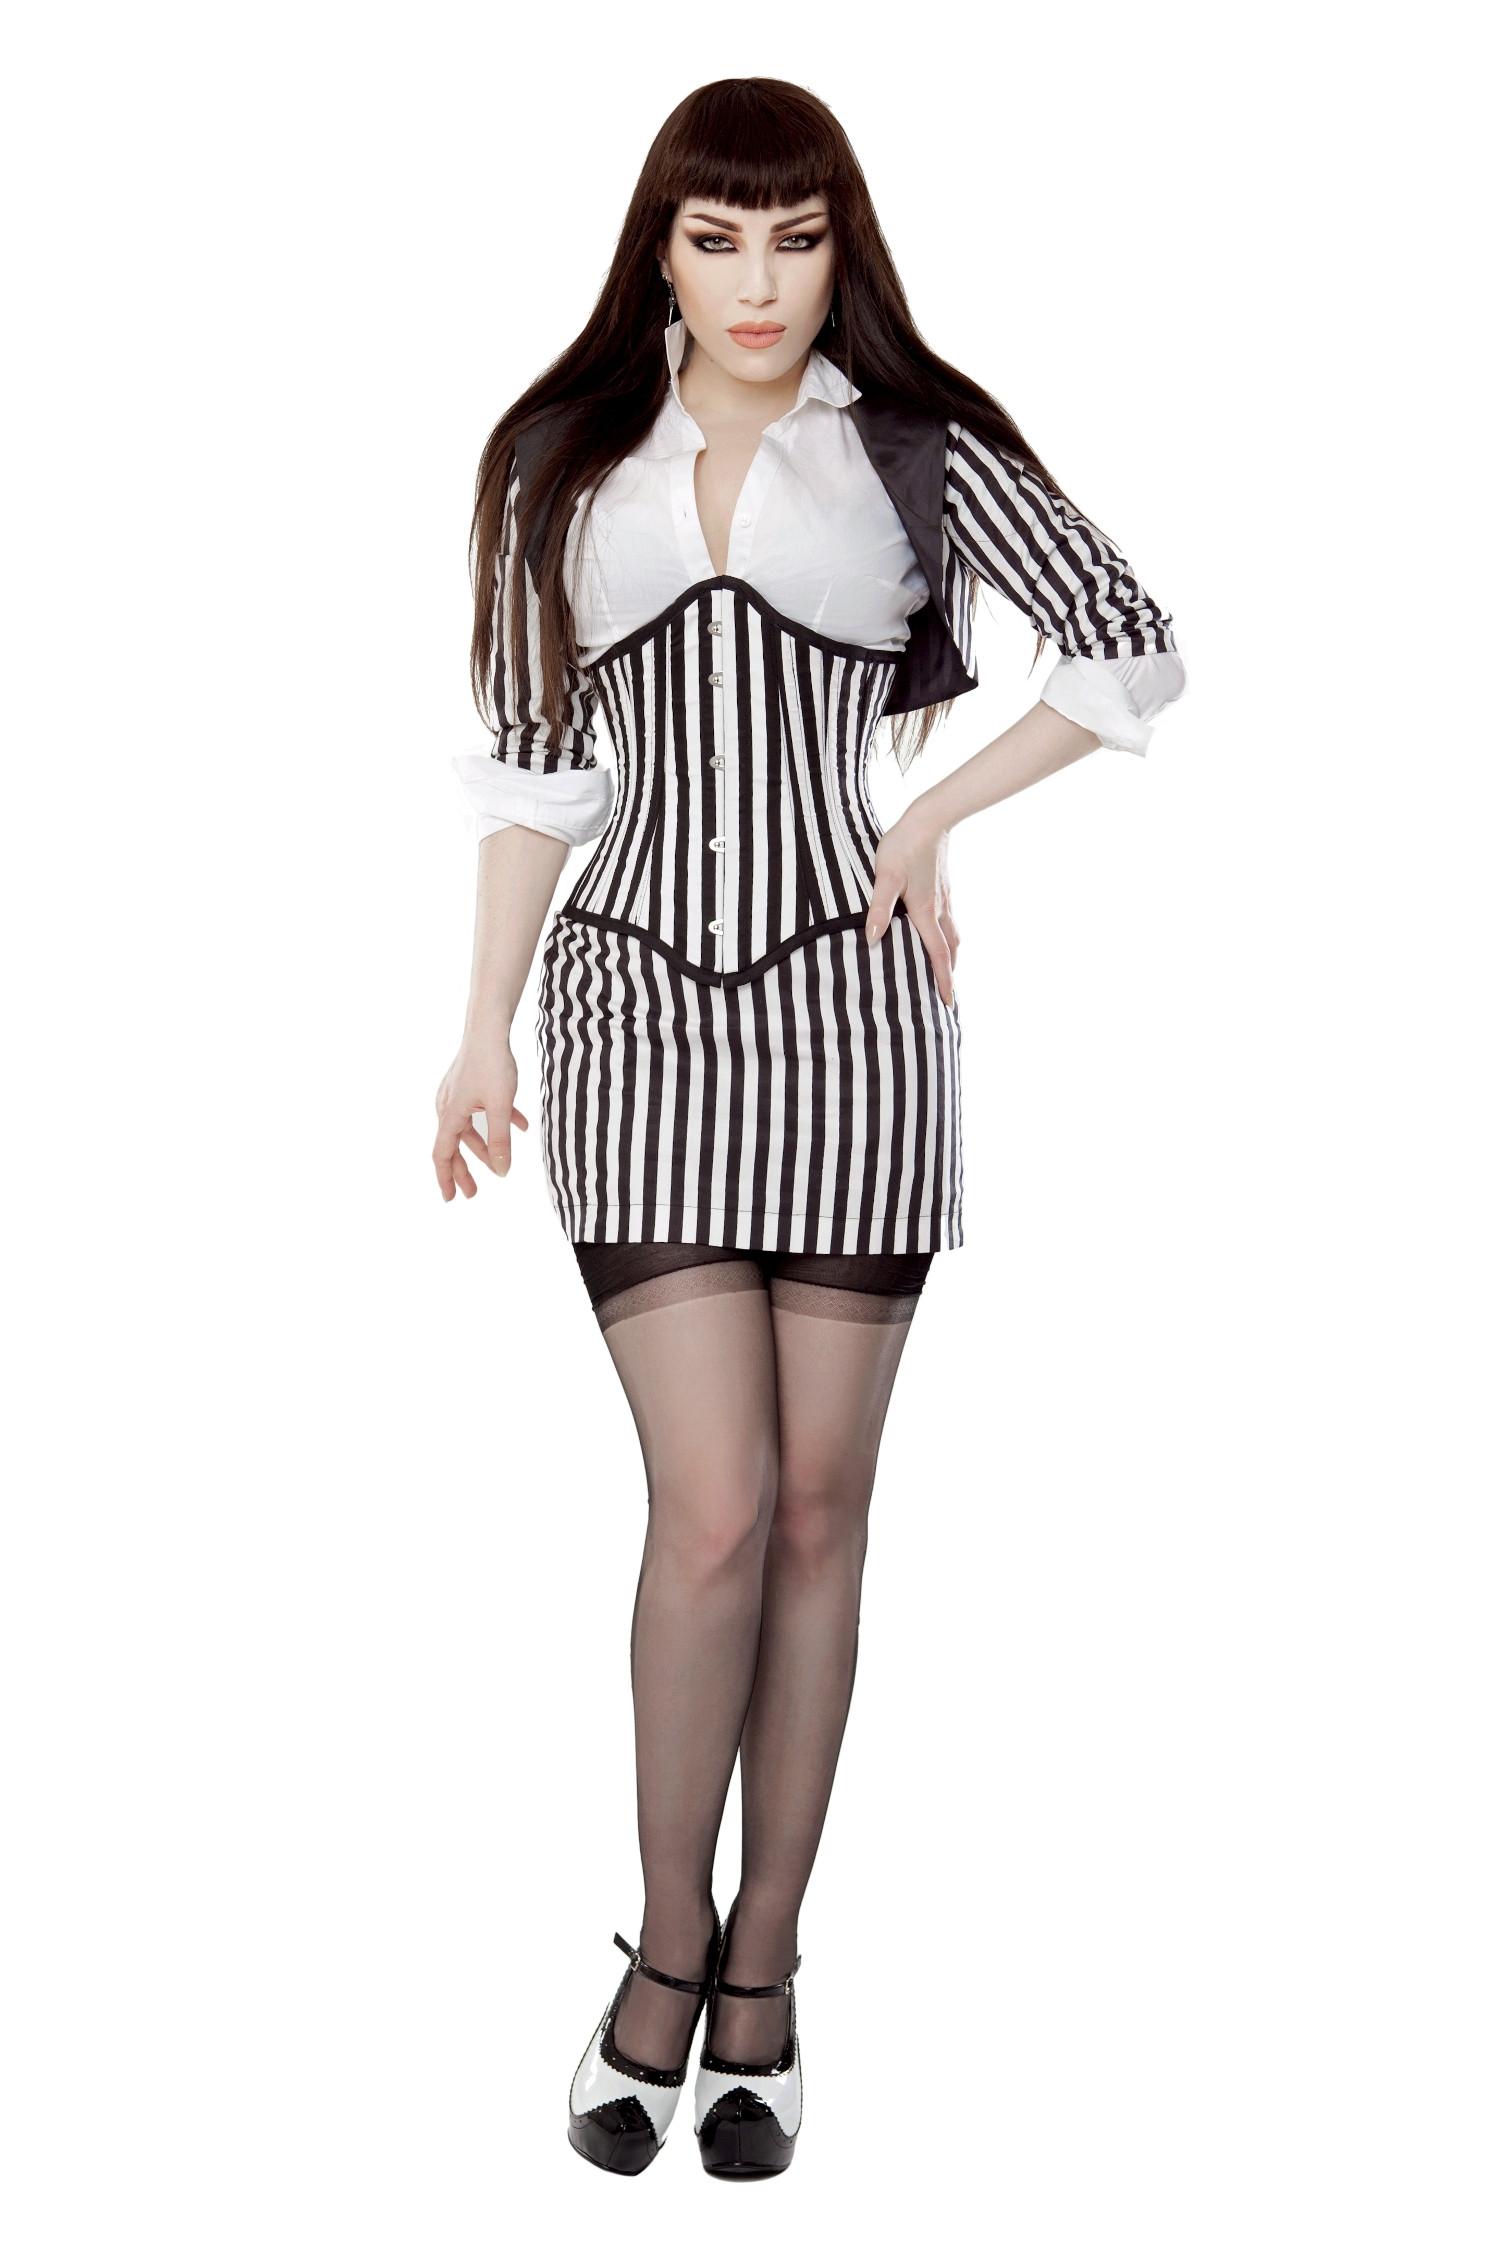 Black & White Fitted Bolero Shrug Top